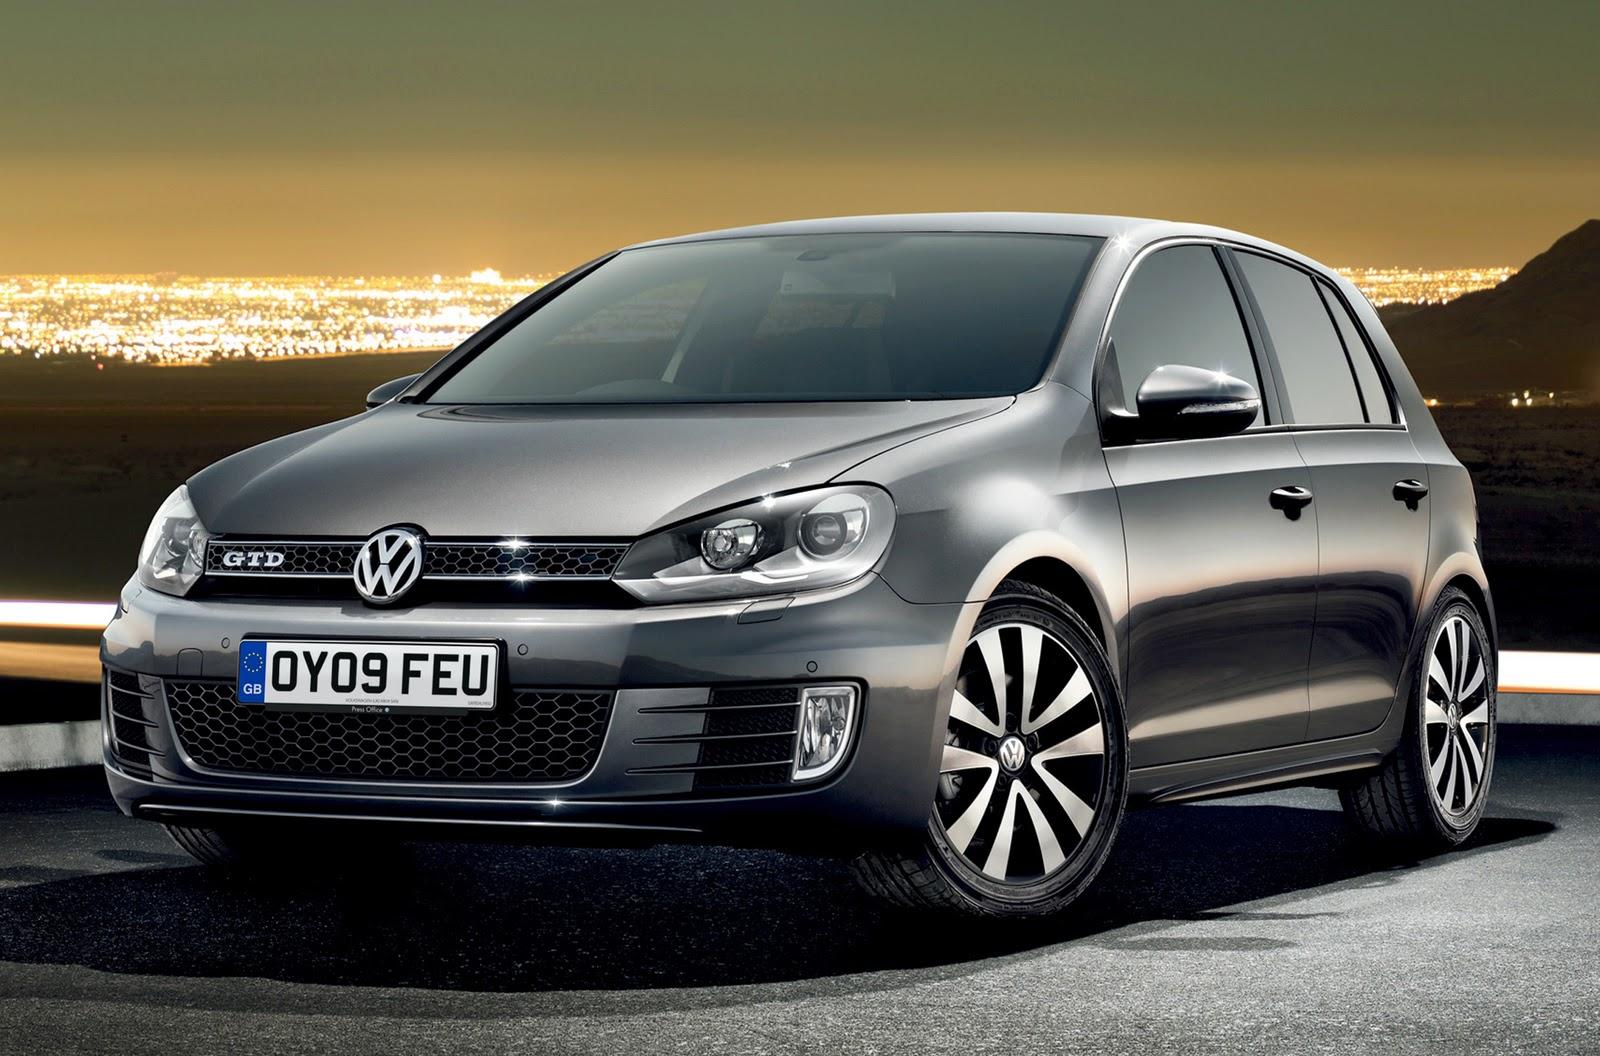 Volkswagen Golf Gti Front Wheel HD Wallpaper 1600x1056